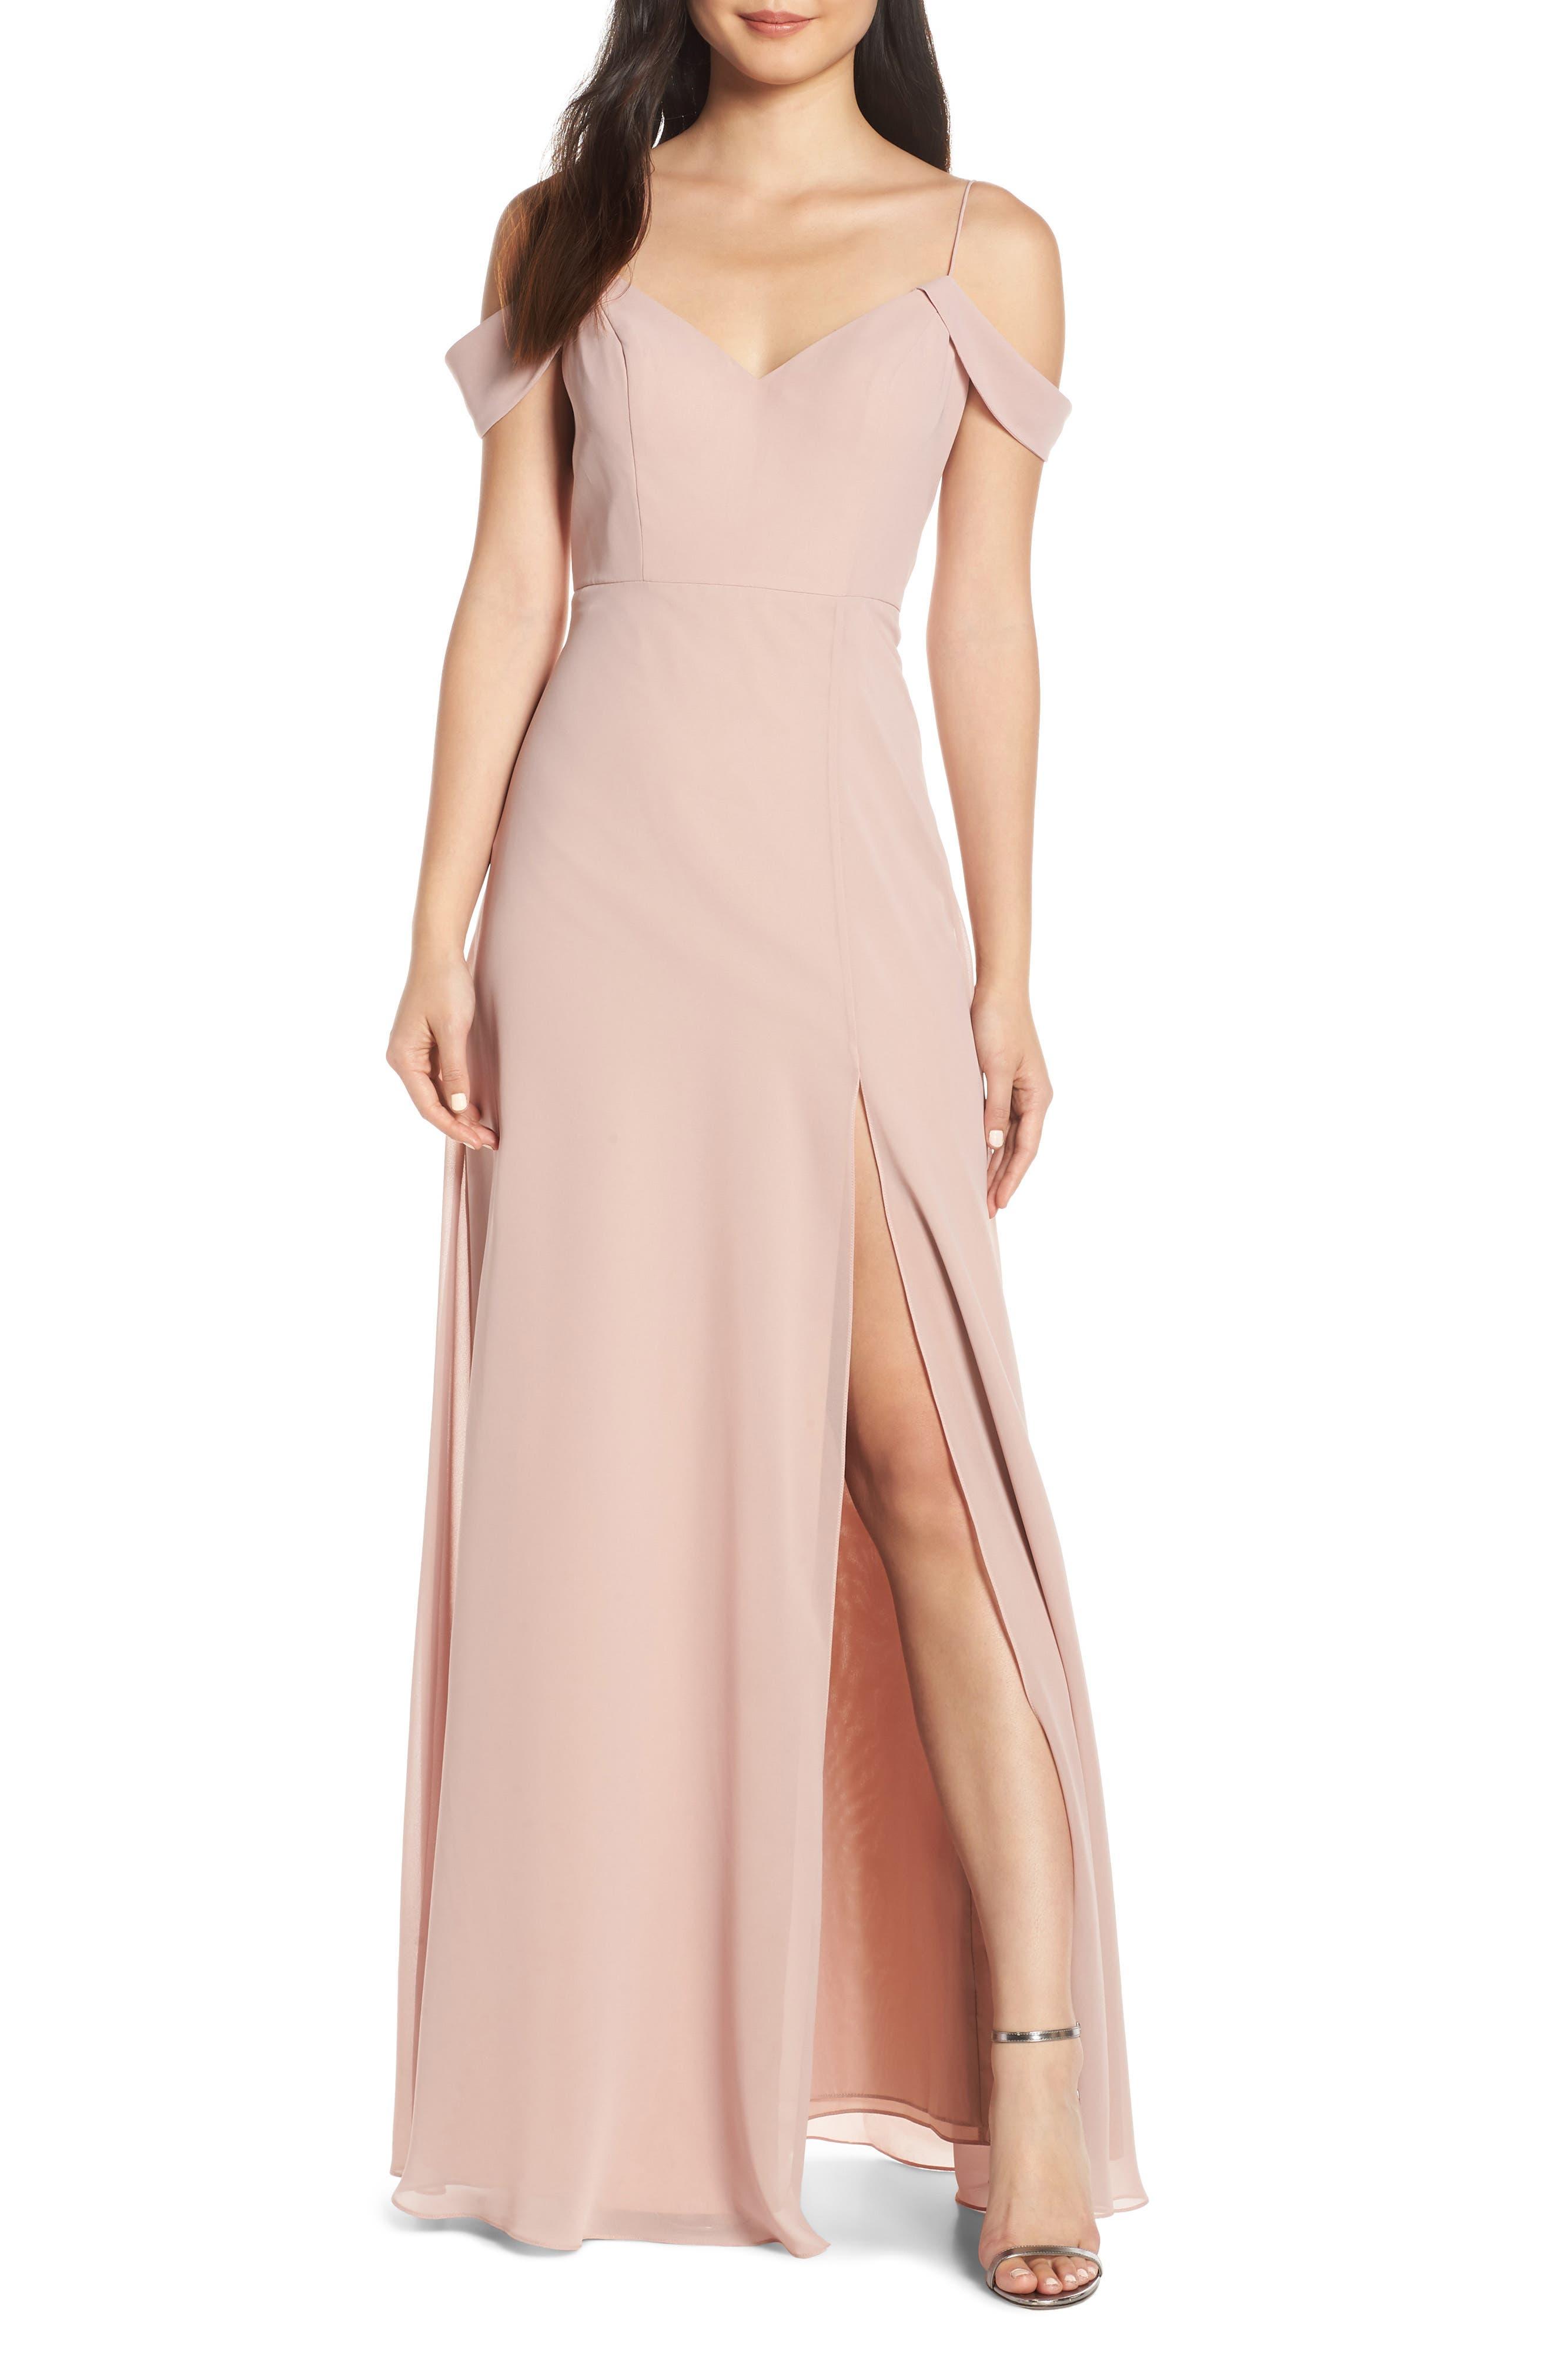 Jenny Yoo Priya Cold Shoulder Chiffon Evening Dress, 8 (similar to 1) - Pink